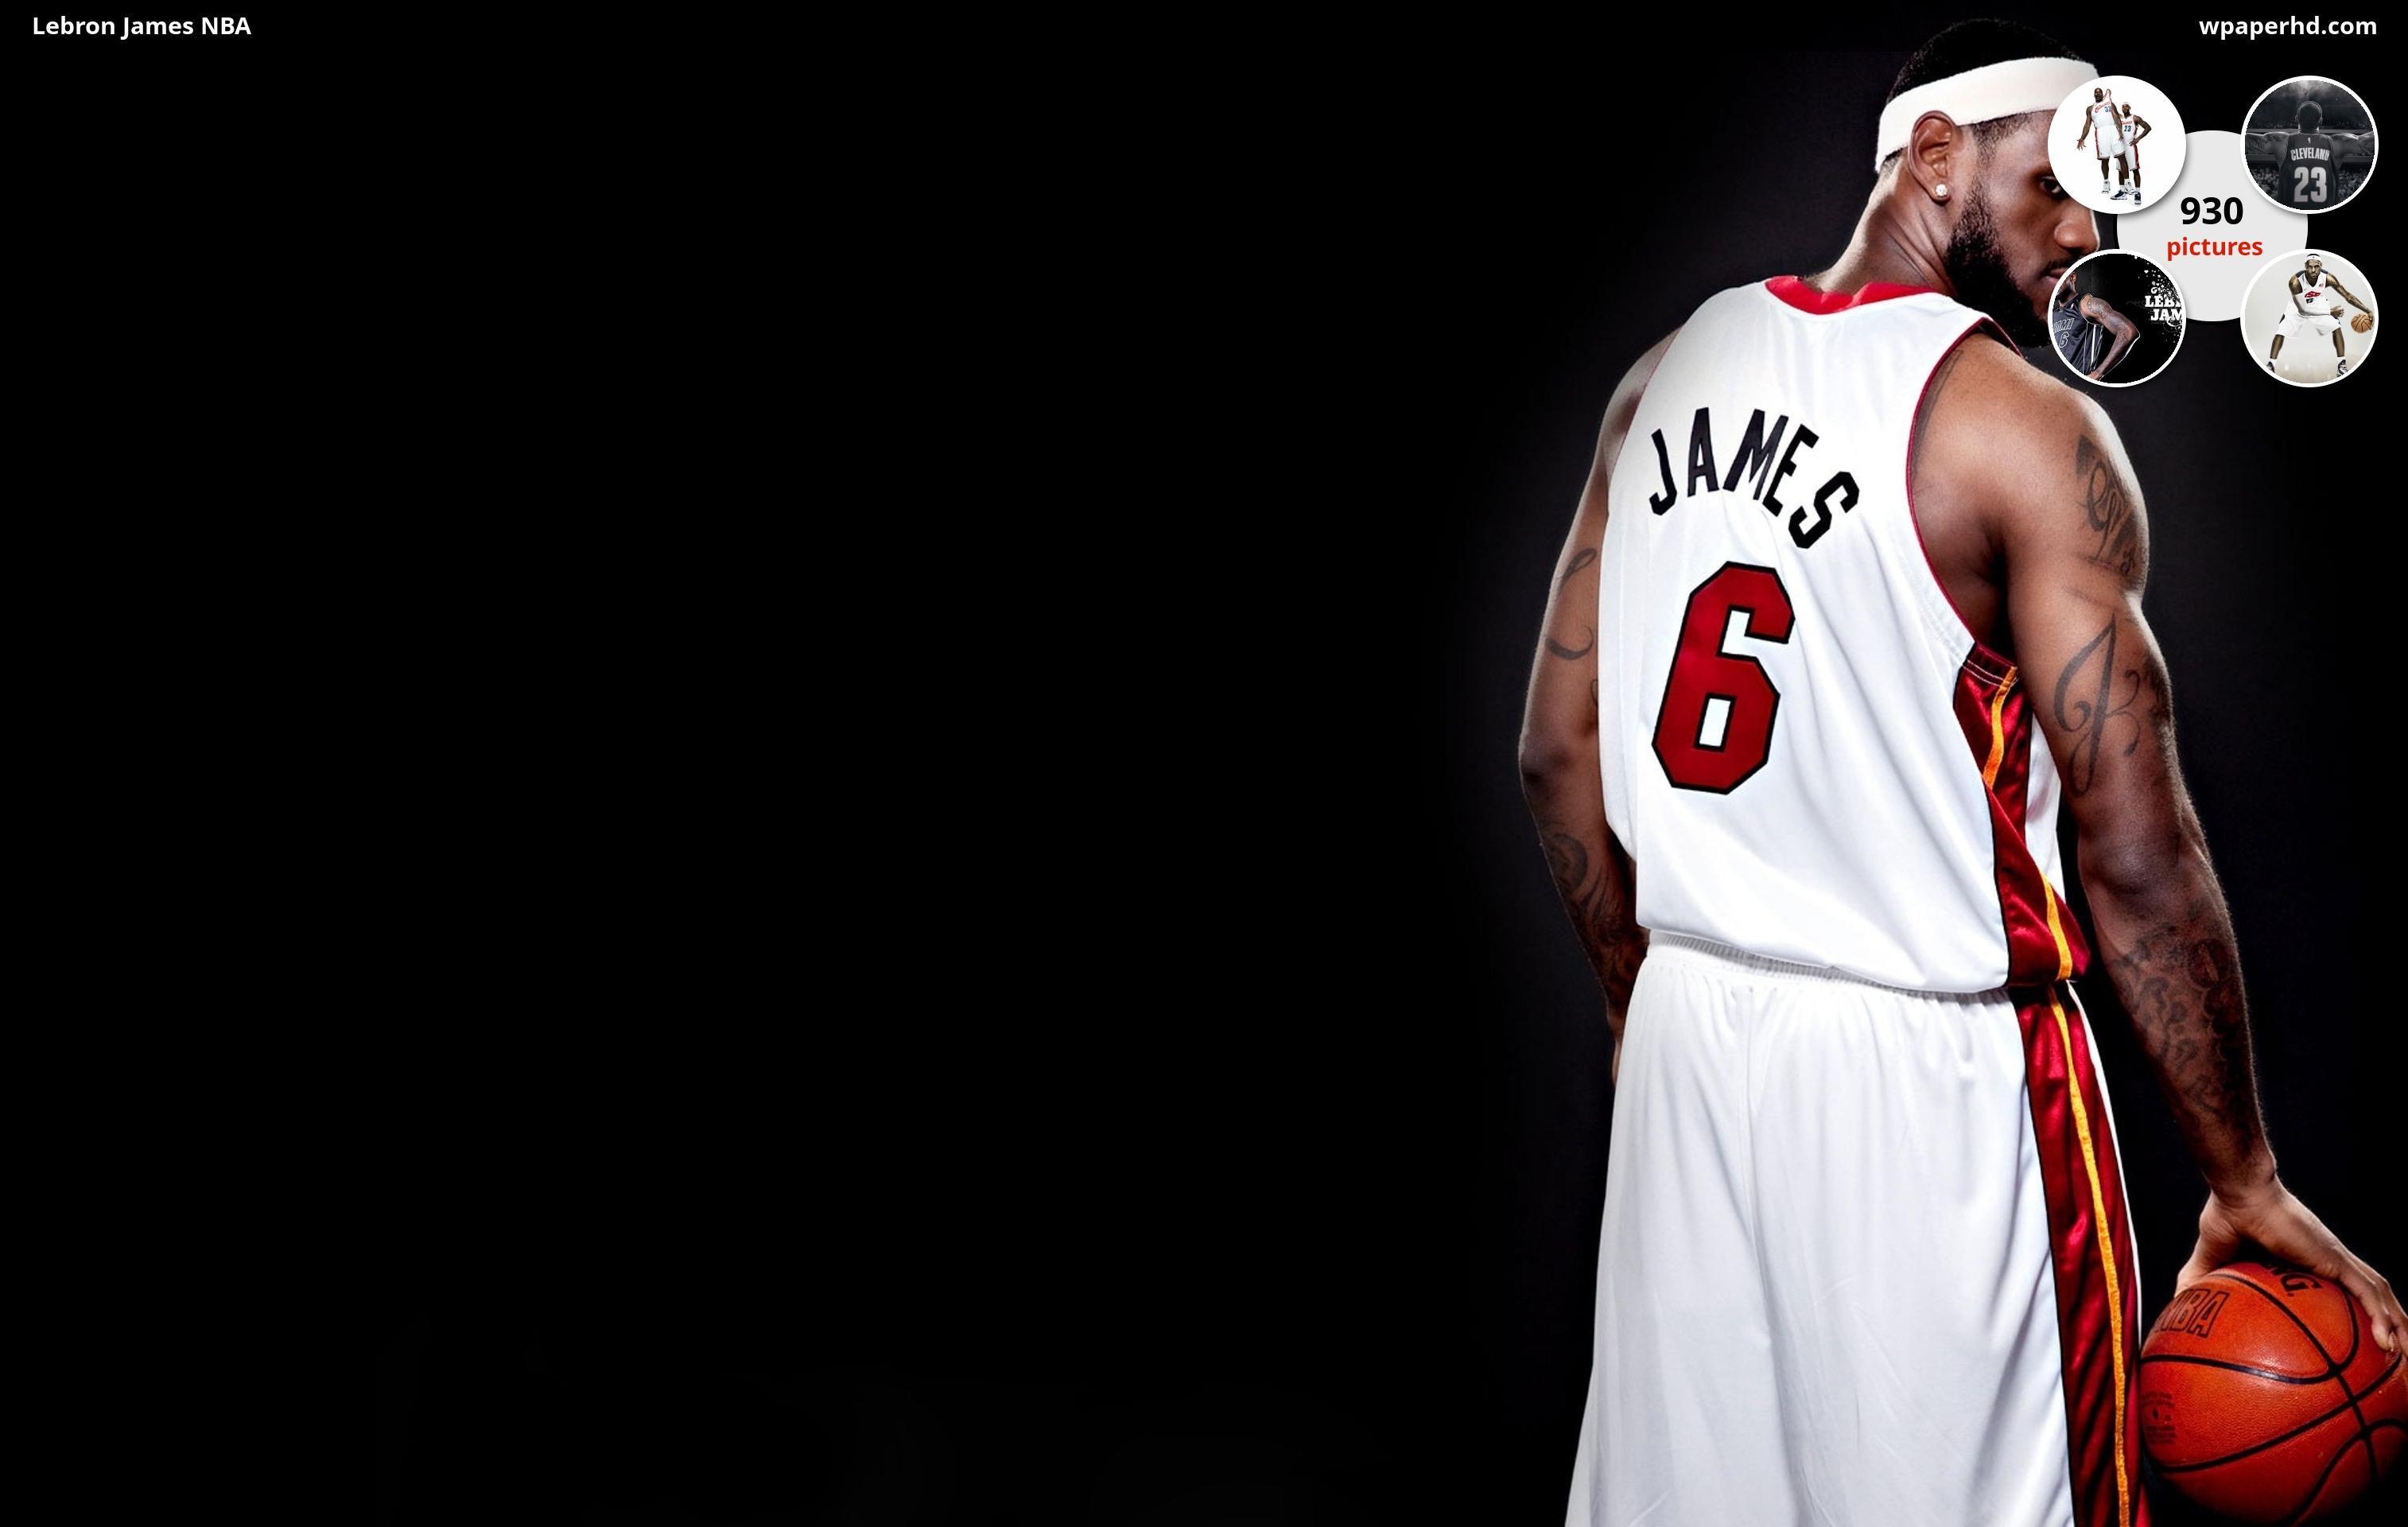 … NBA Players Wallpapers HD 4